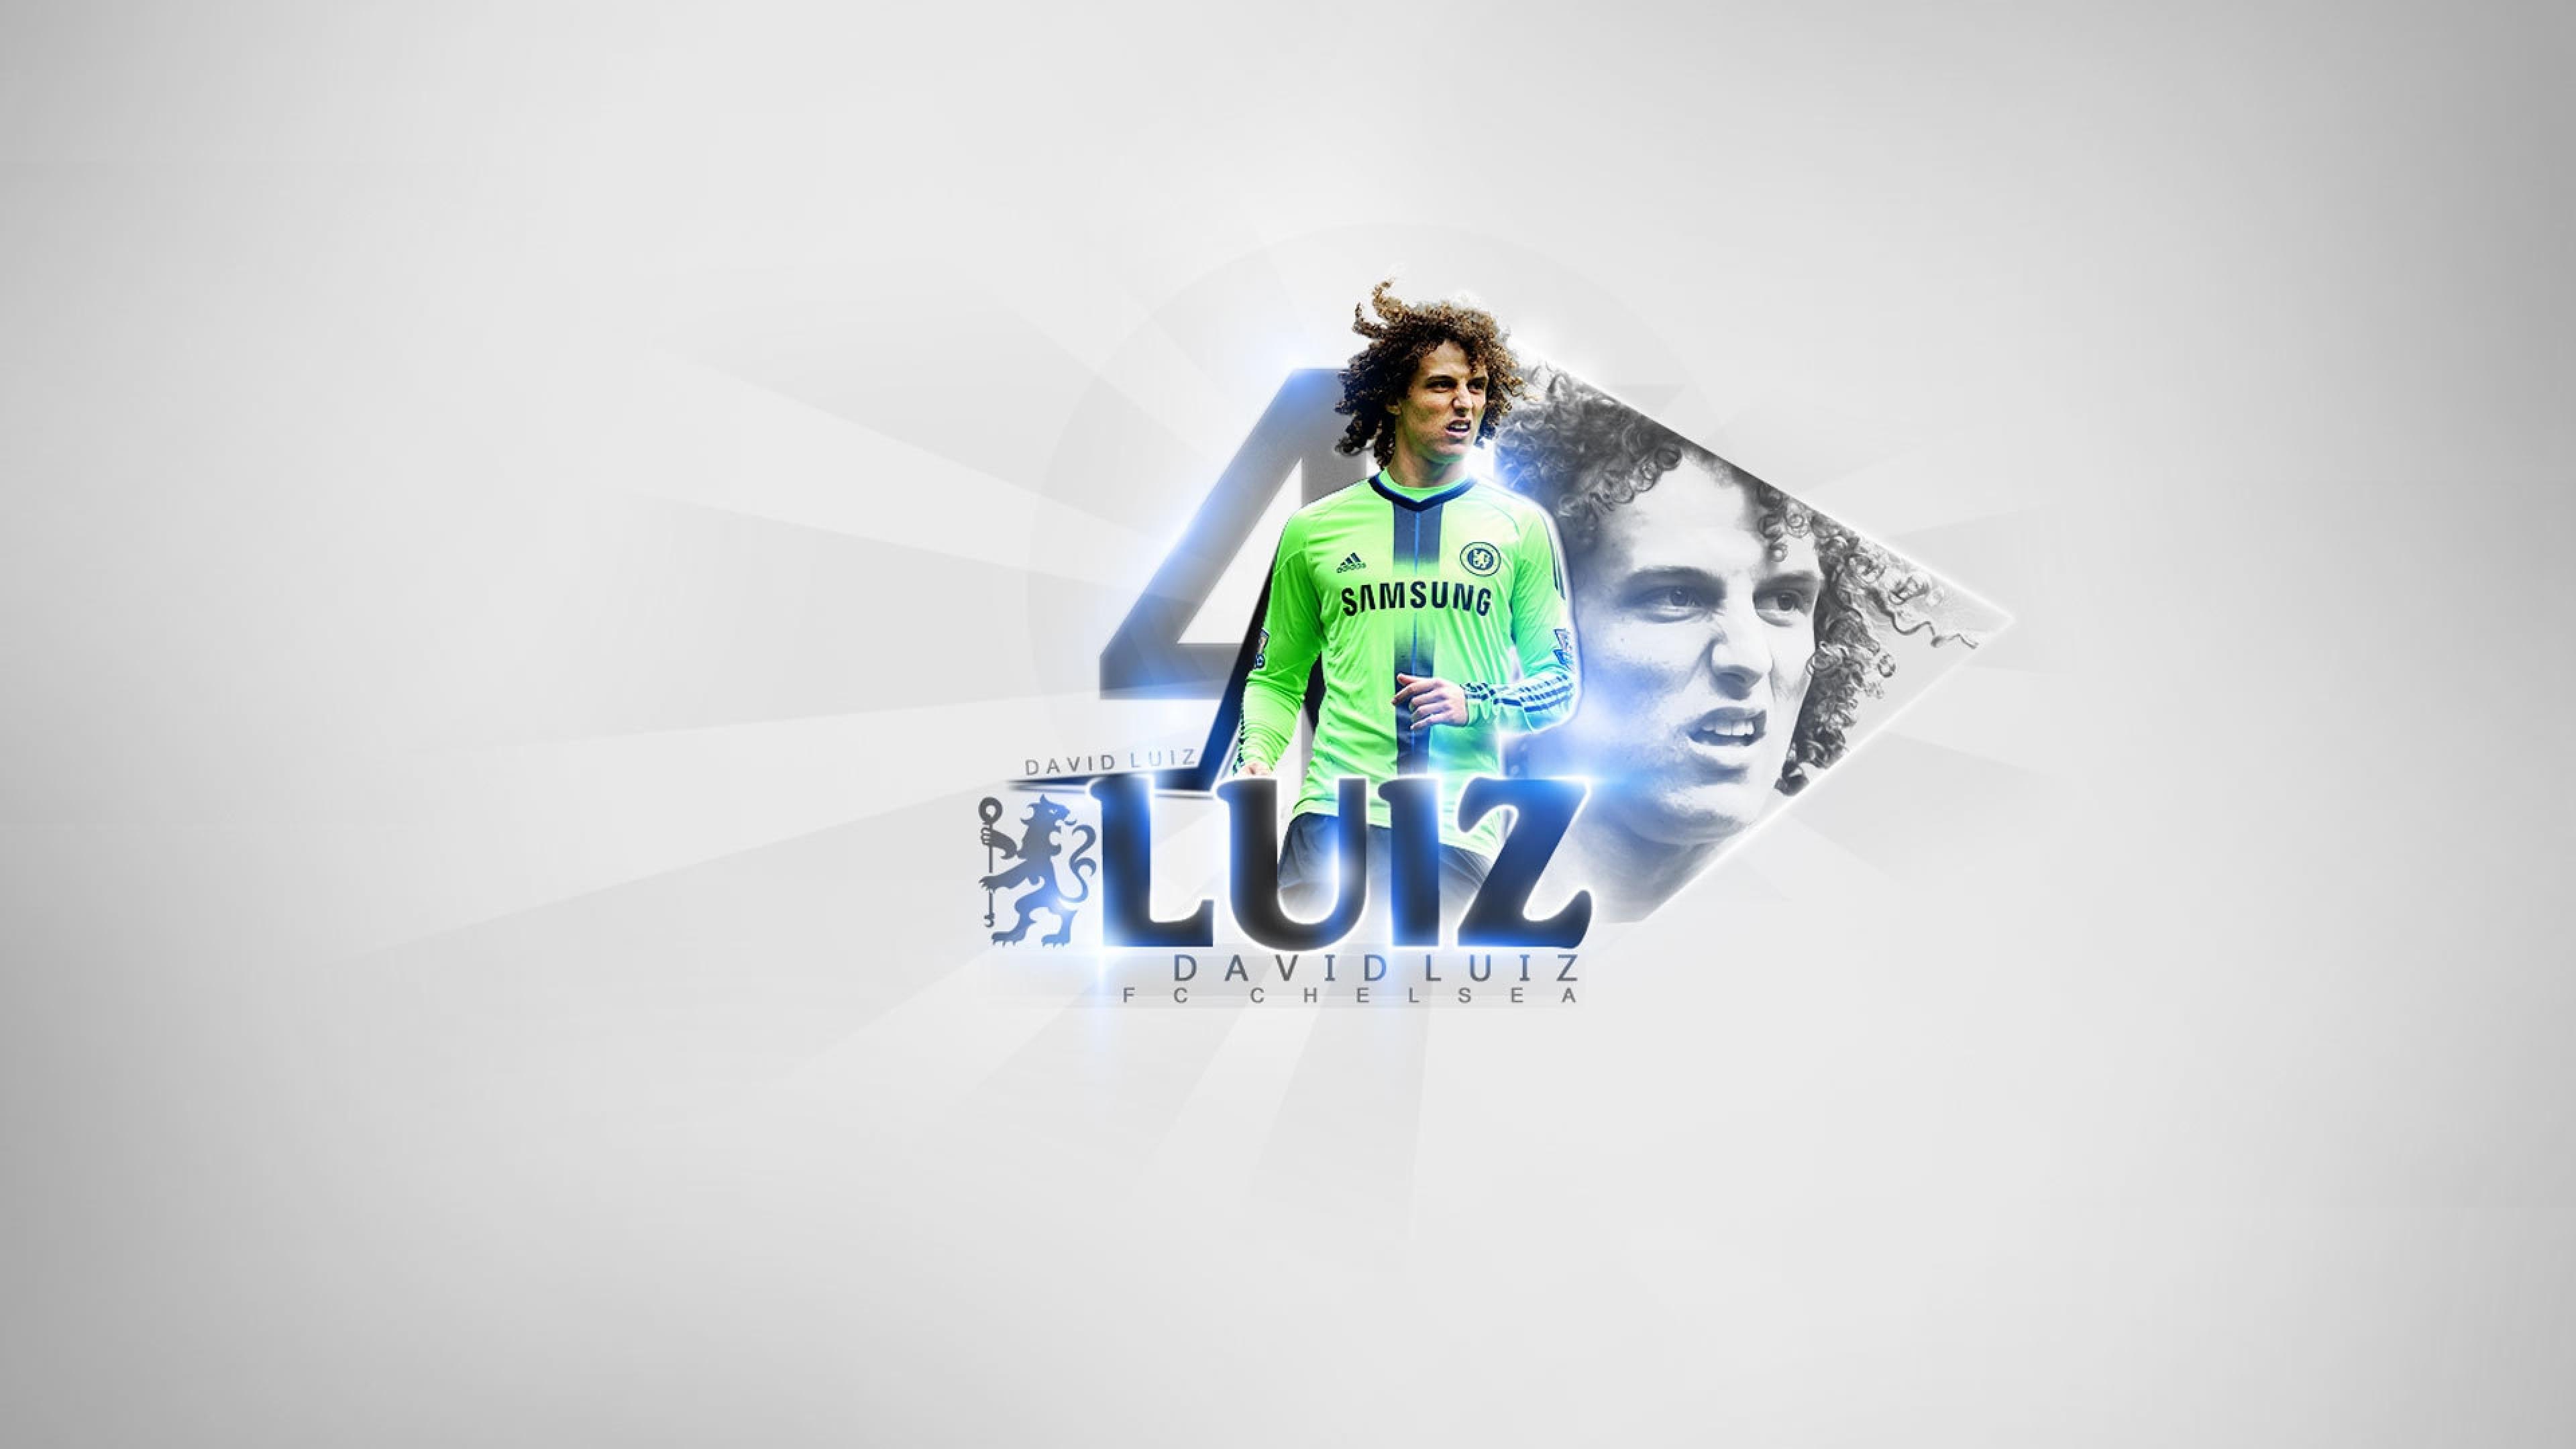 David Luiz, Chelsea, Footballer, Full HD Wallpaper